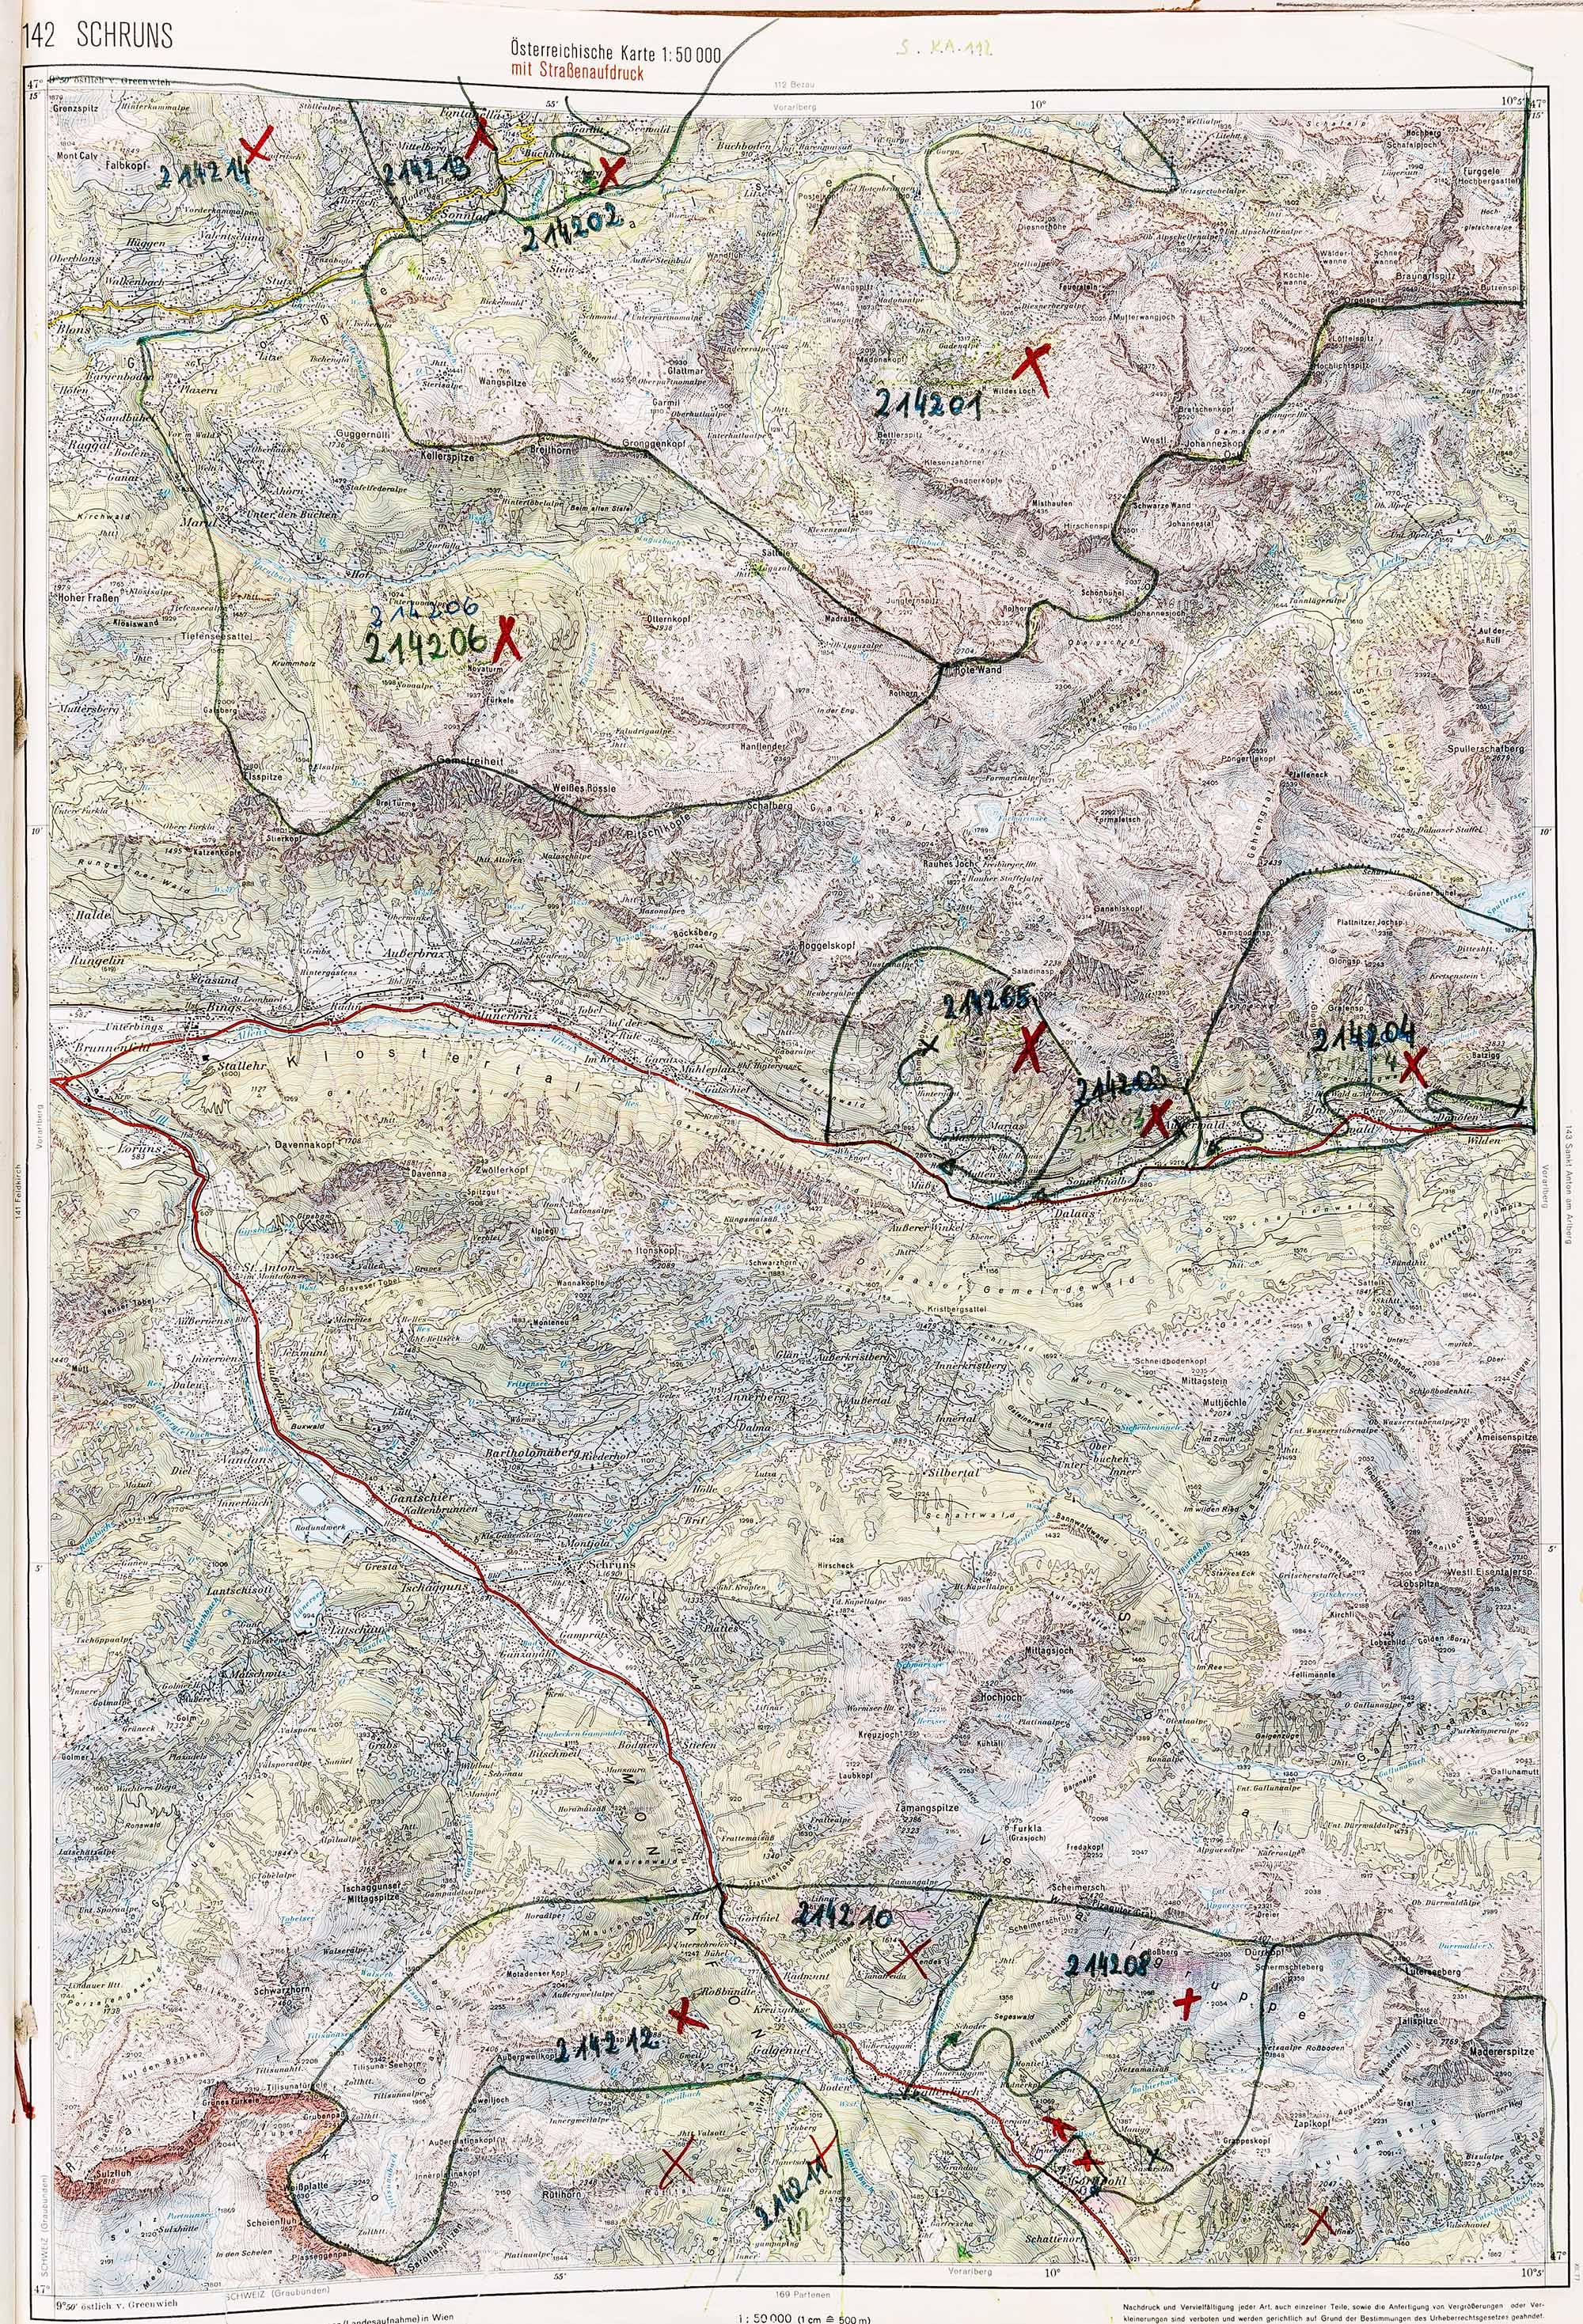 1979-1982 Karte 142